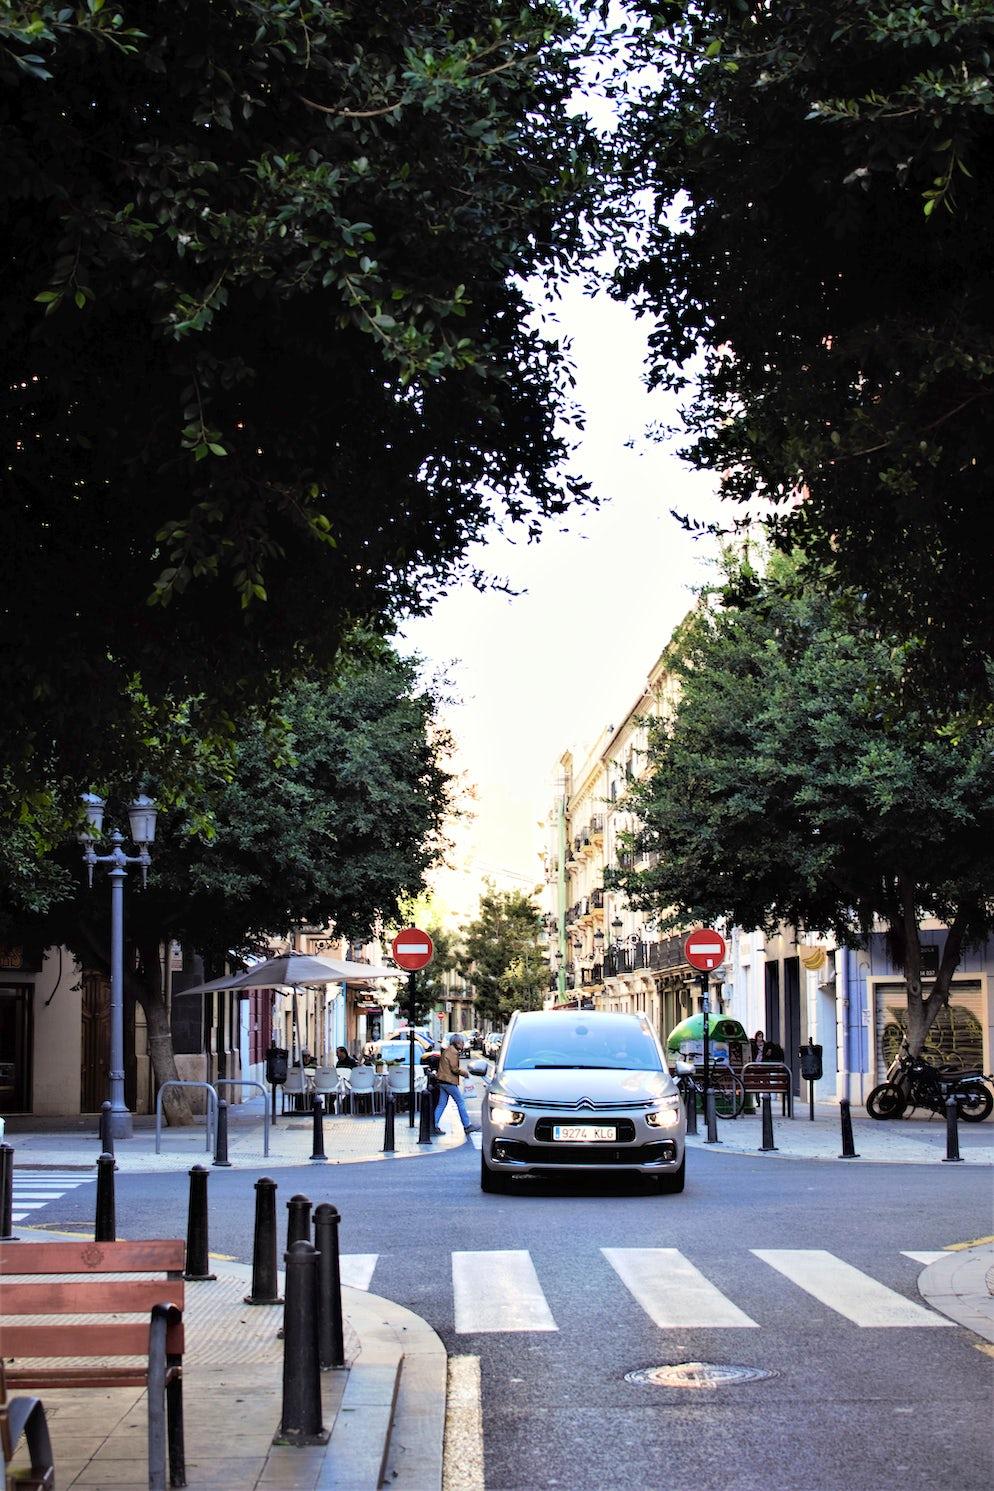 Street in Ruzafa - Photo credit @ Joe Thorpe